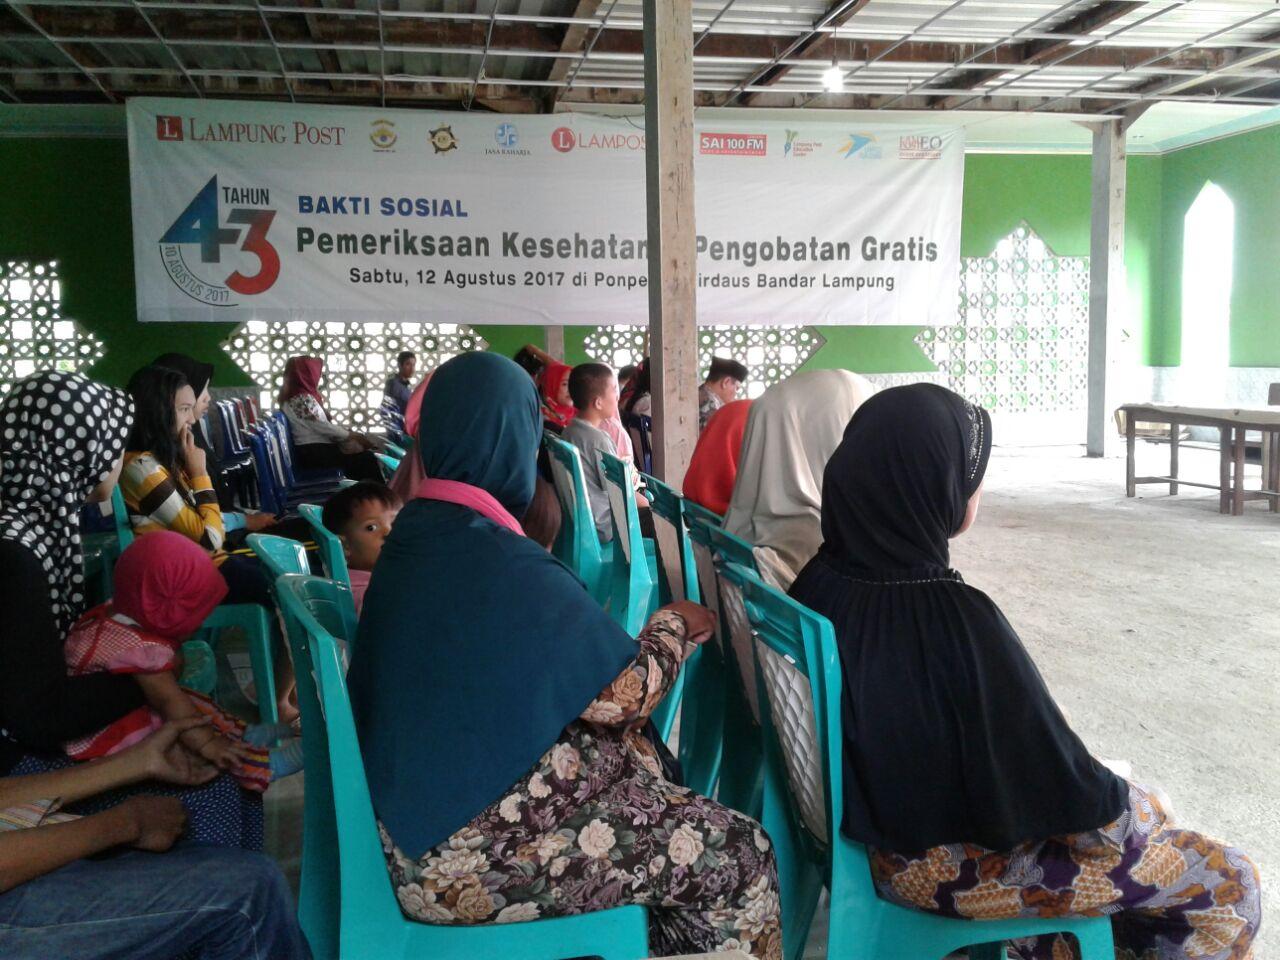 LAMPUNG POST   Rangkaian HUT,  Lampung Post Gelar Bakti Sosial Kesehatan